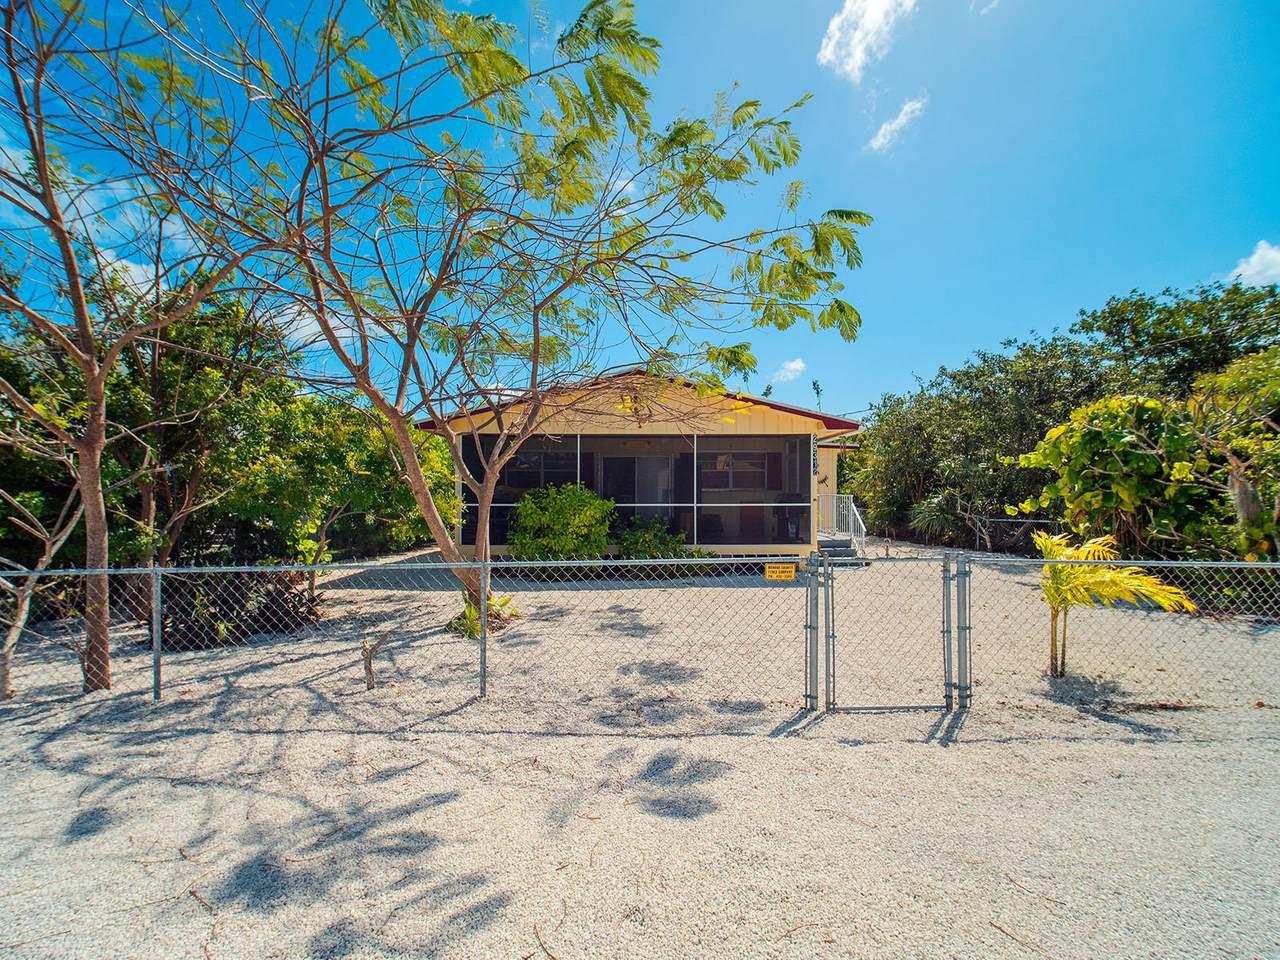 29312 Coconut Palm Drive - Photo 1